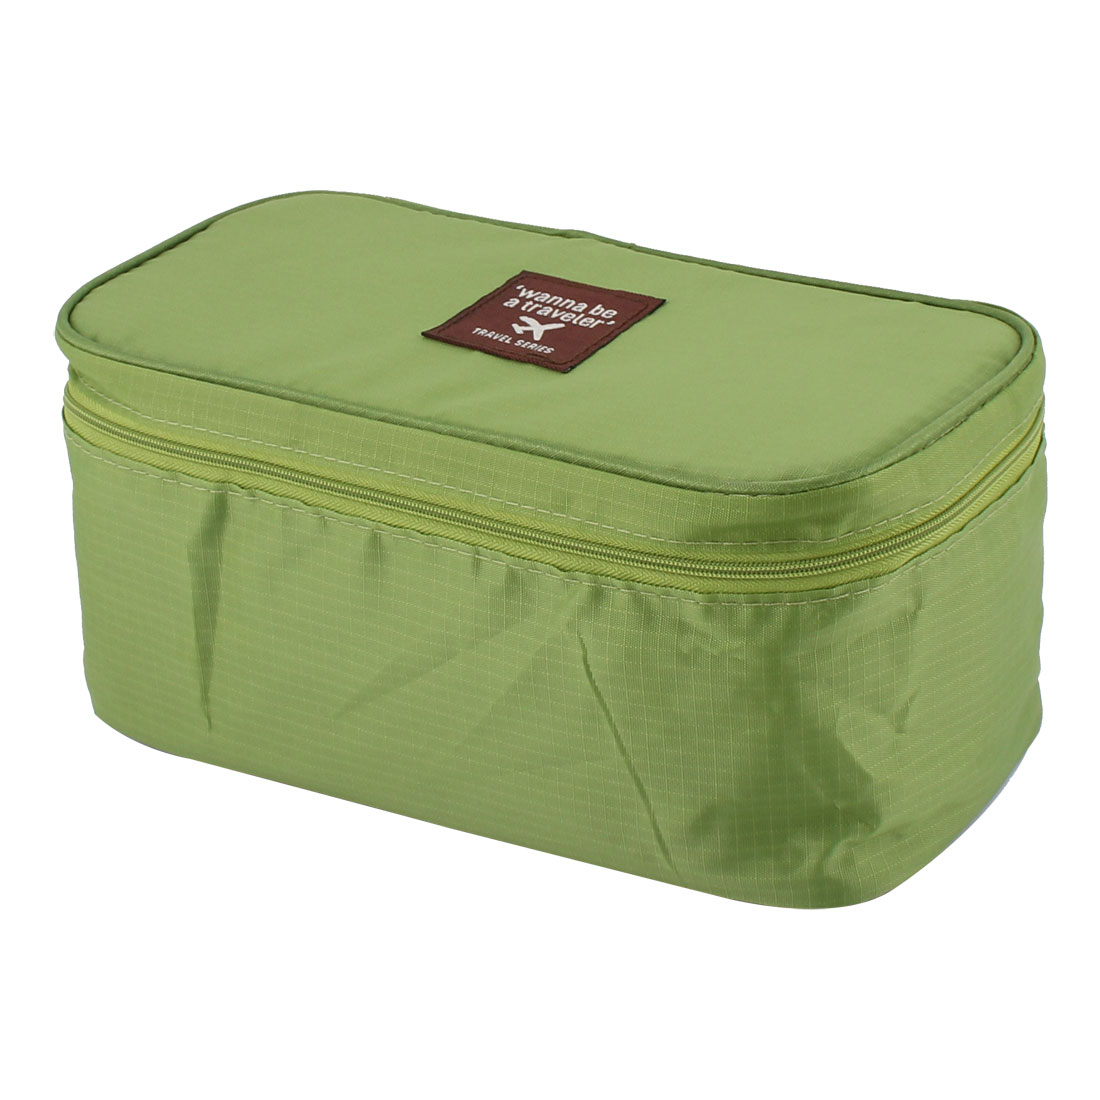 Portable Travel Clothes Sock Shoe Cosmetics Holder Storage Bag Organizer Green